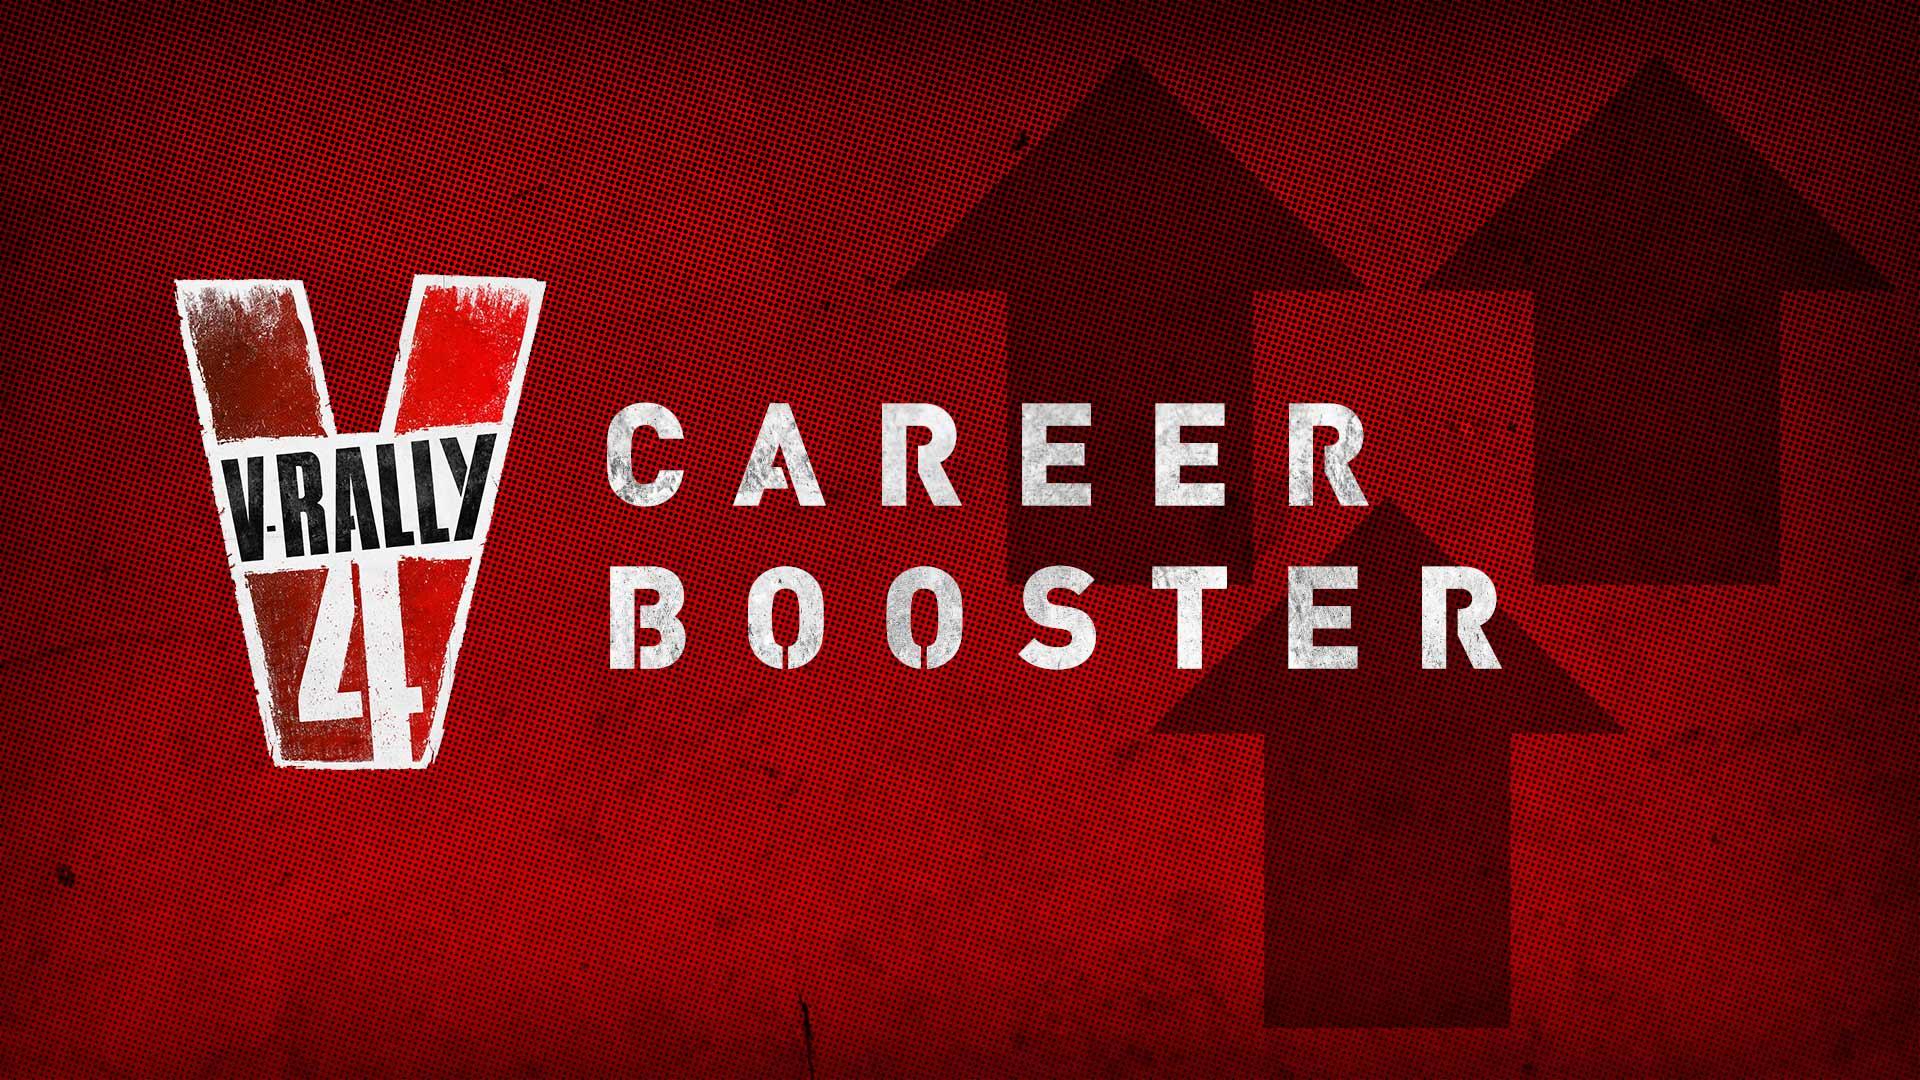 V-Rally 4 - Career Booster